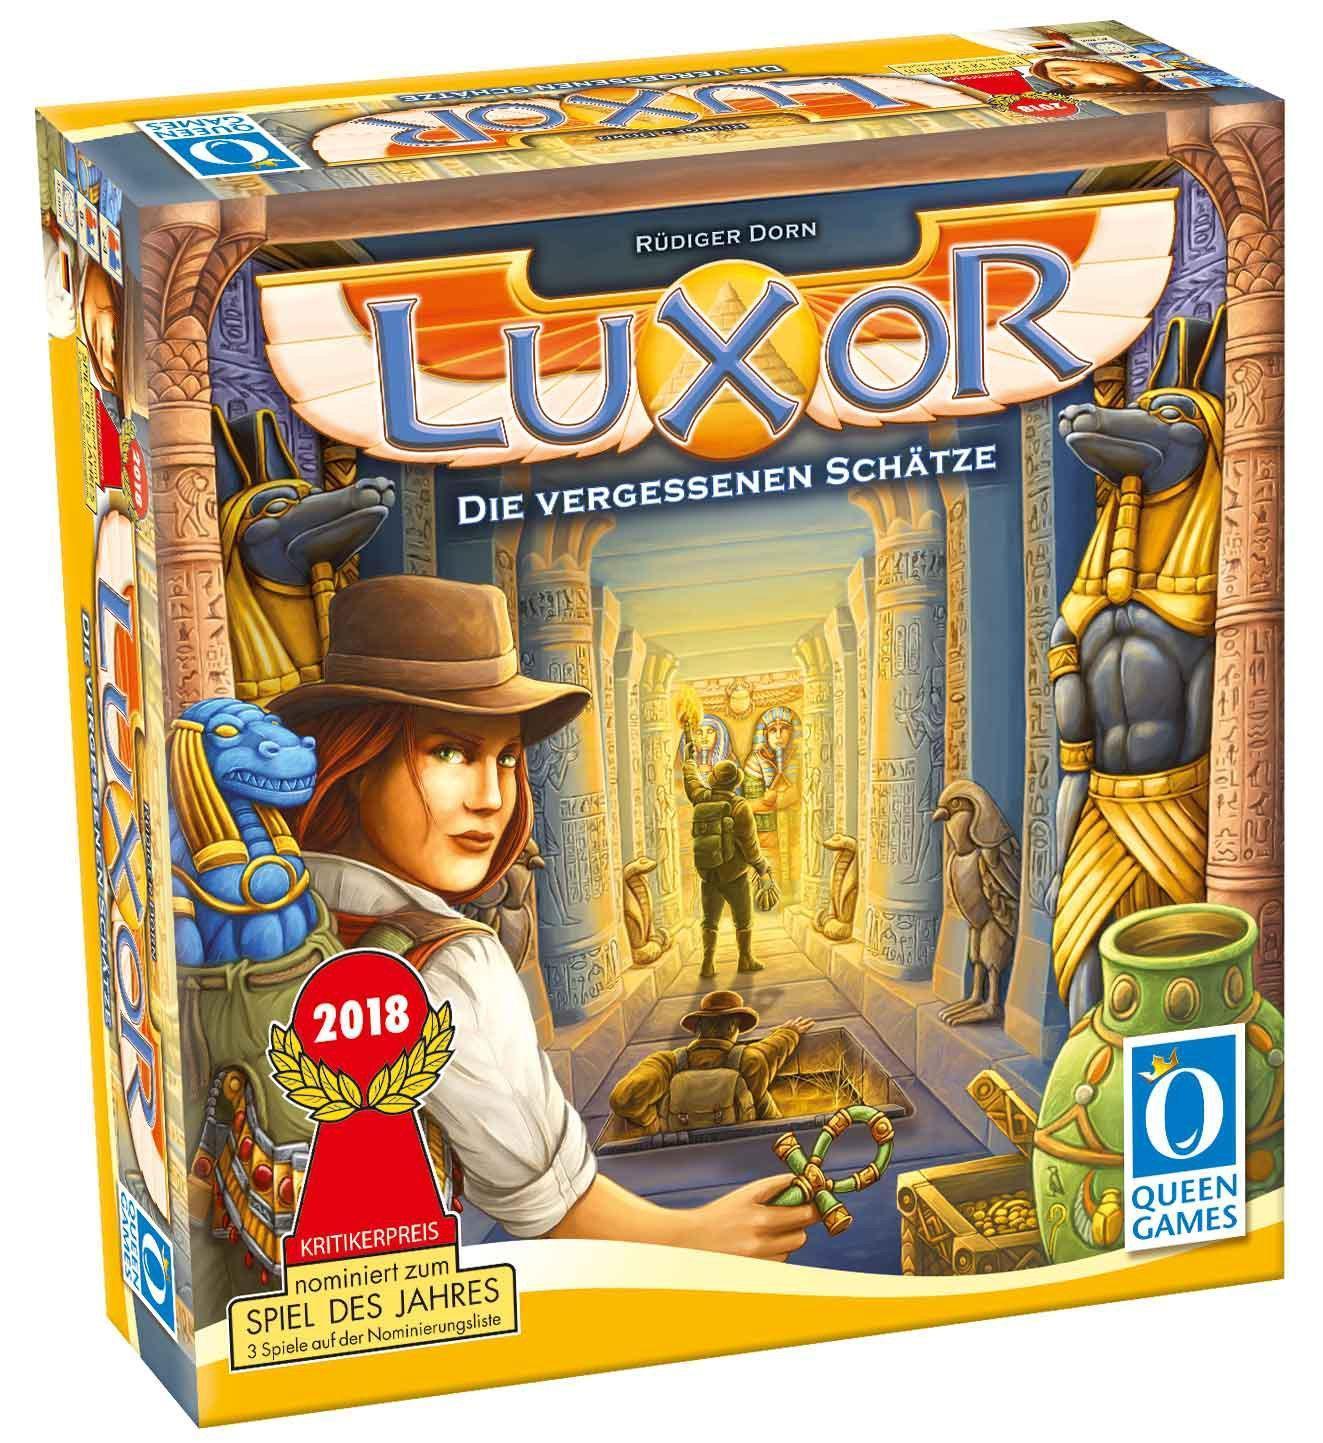 Luxor Brettspiel